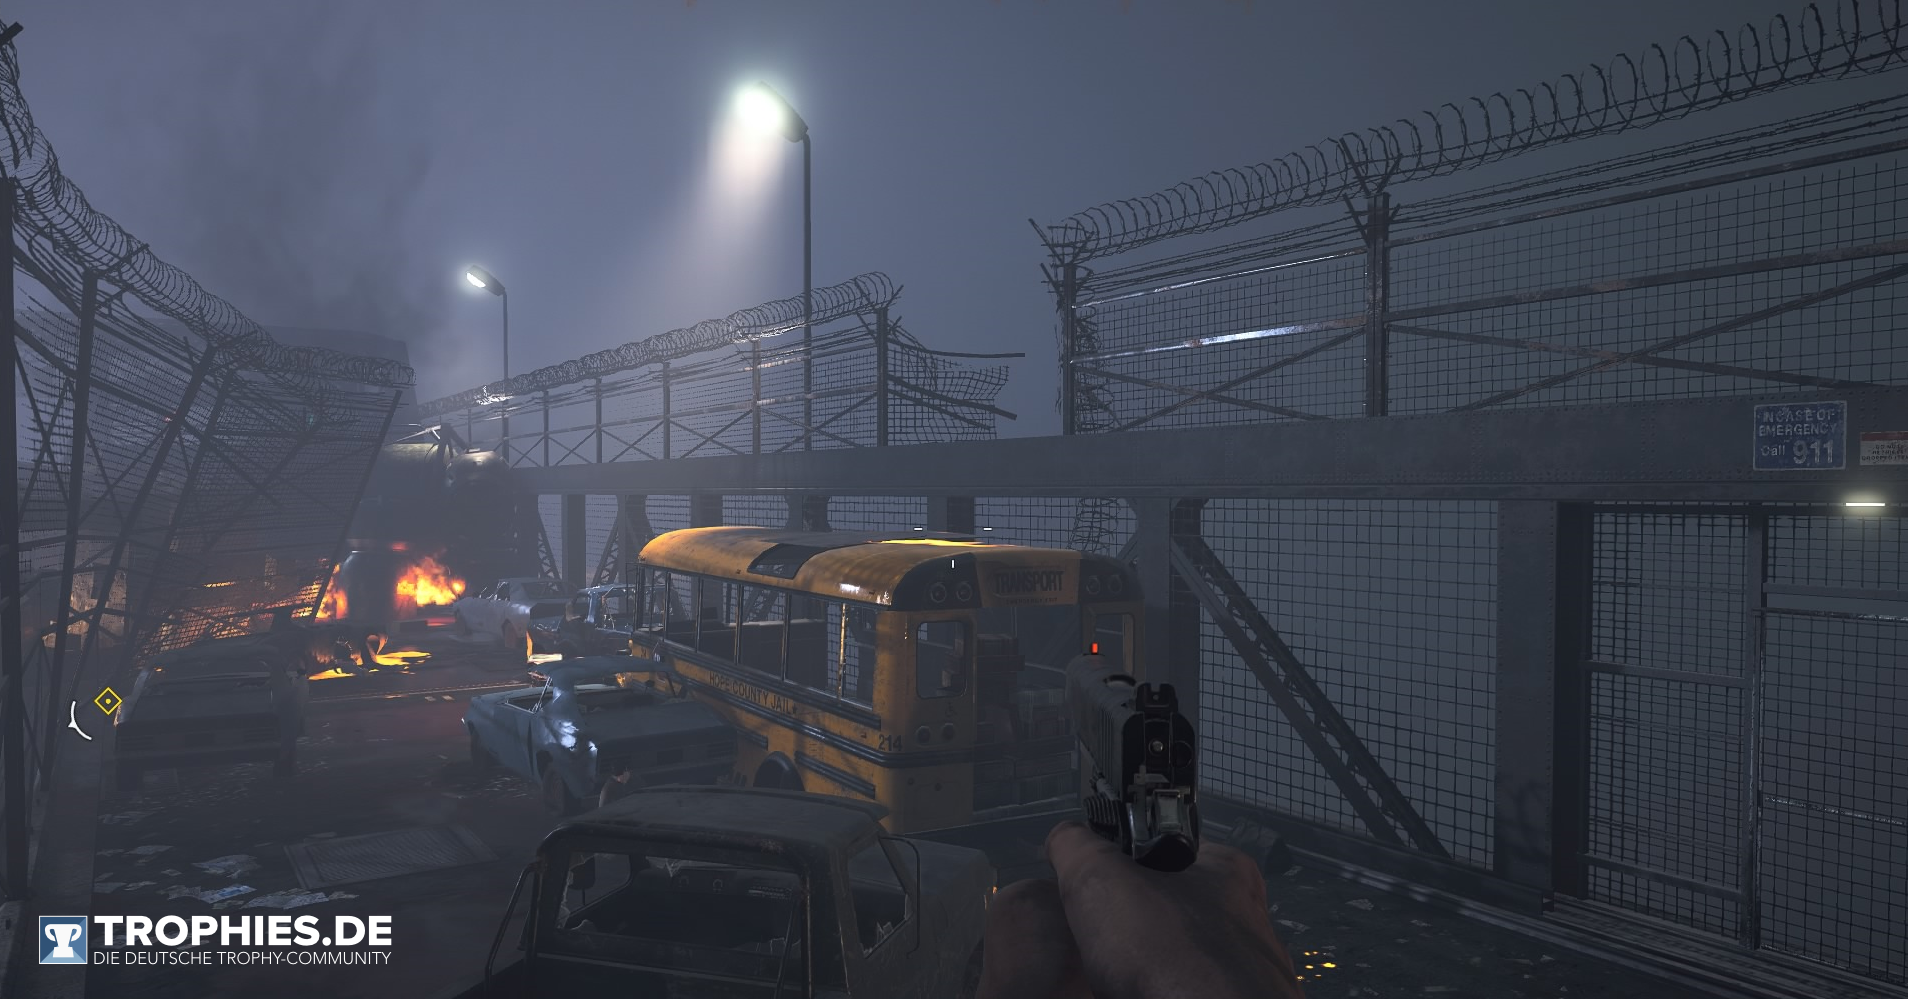 Far Cry 5 Wolfsköder Karte.Trophäen Leitfaden Far Cry 5 Far Cry 5 Trophies De Ps4 Ps3